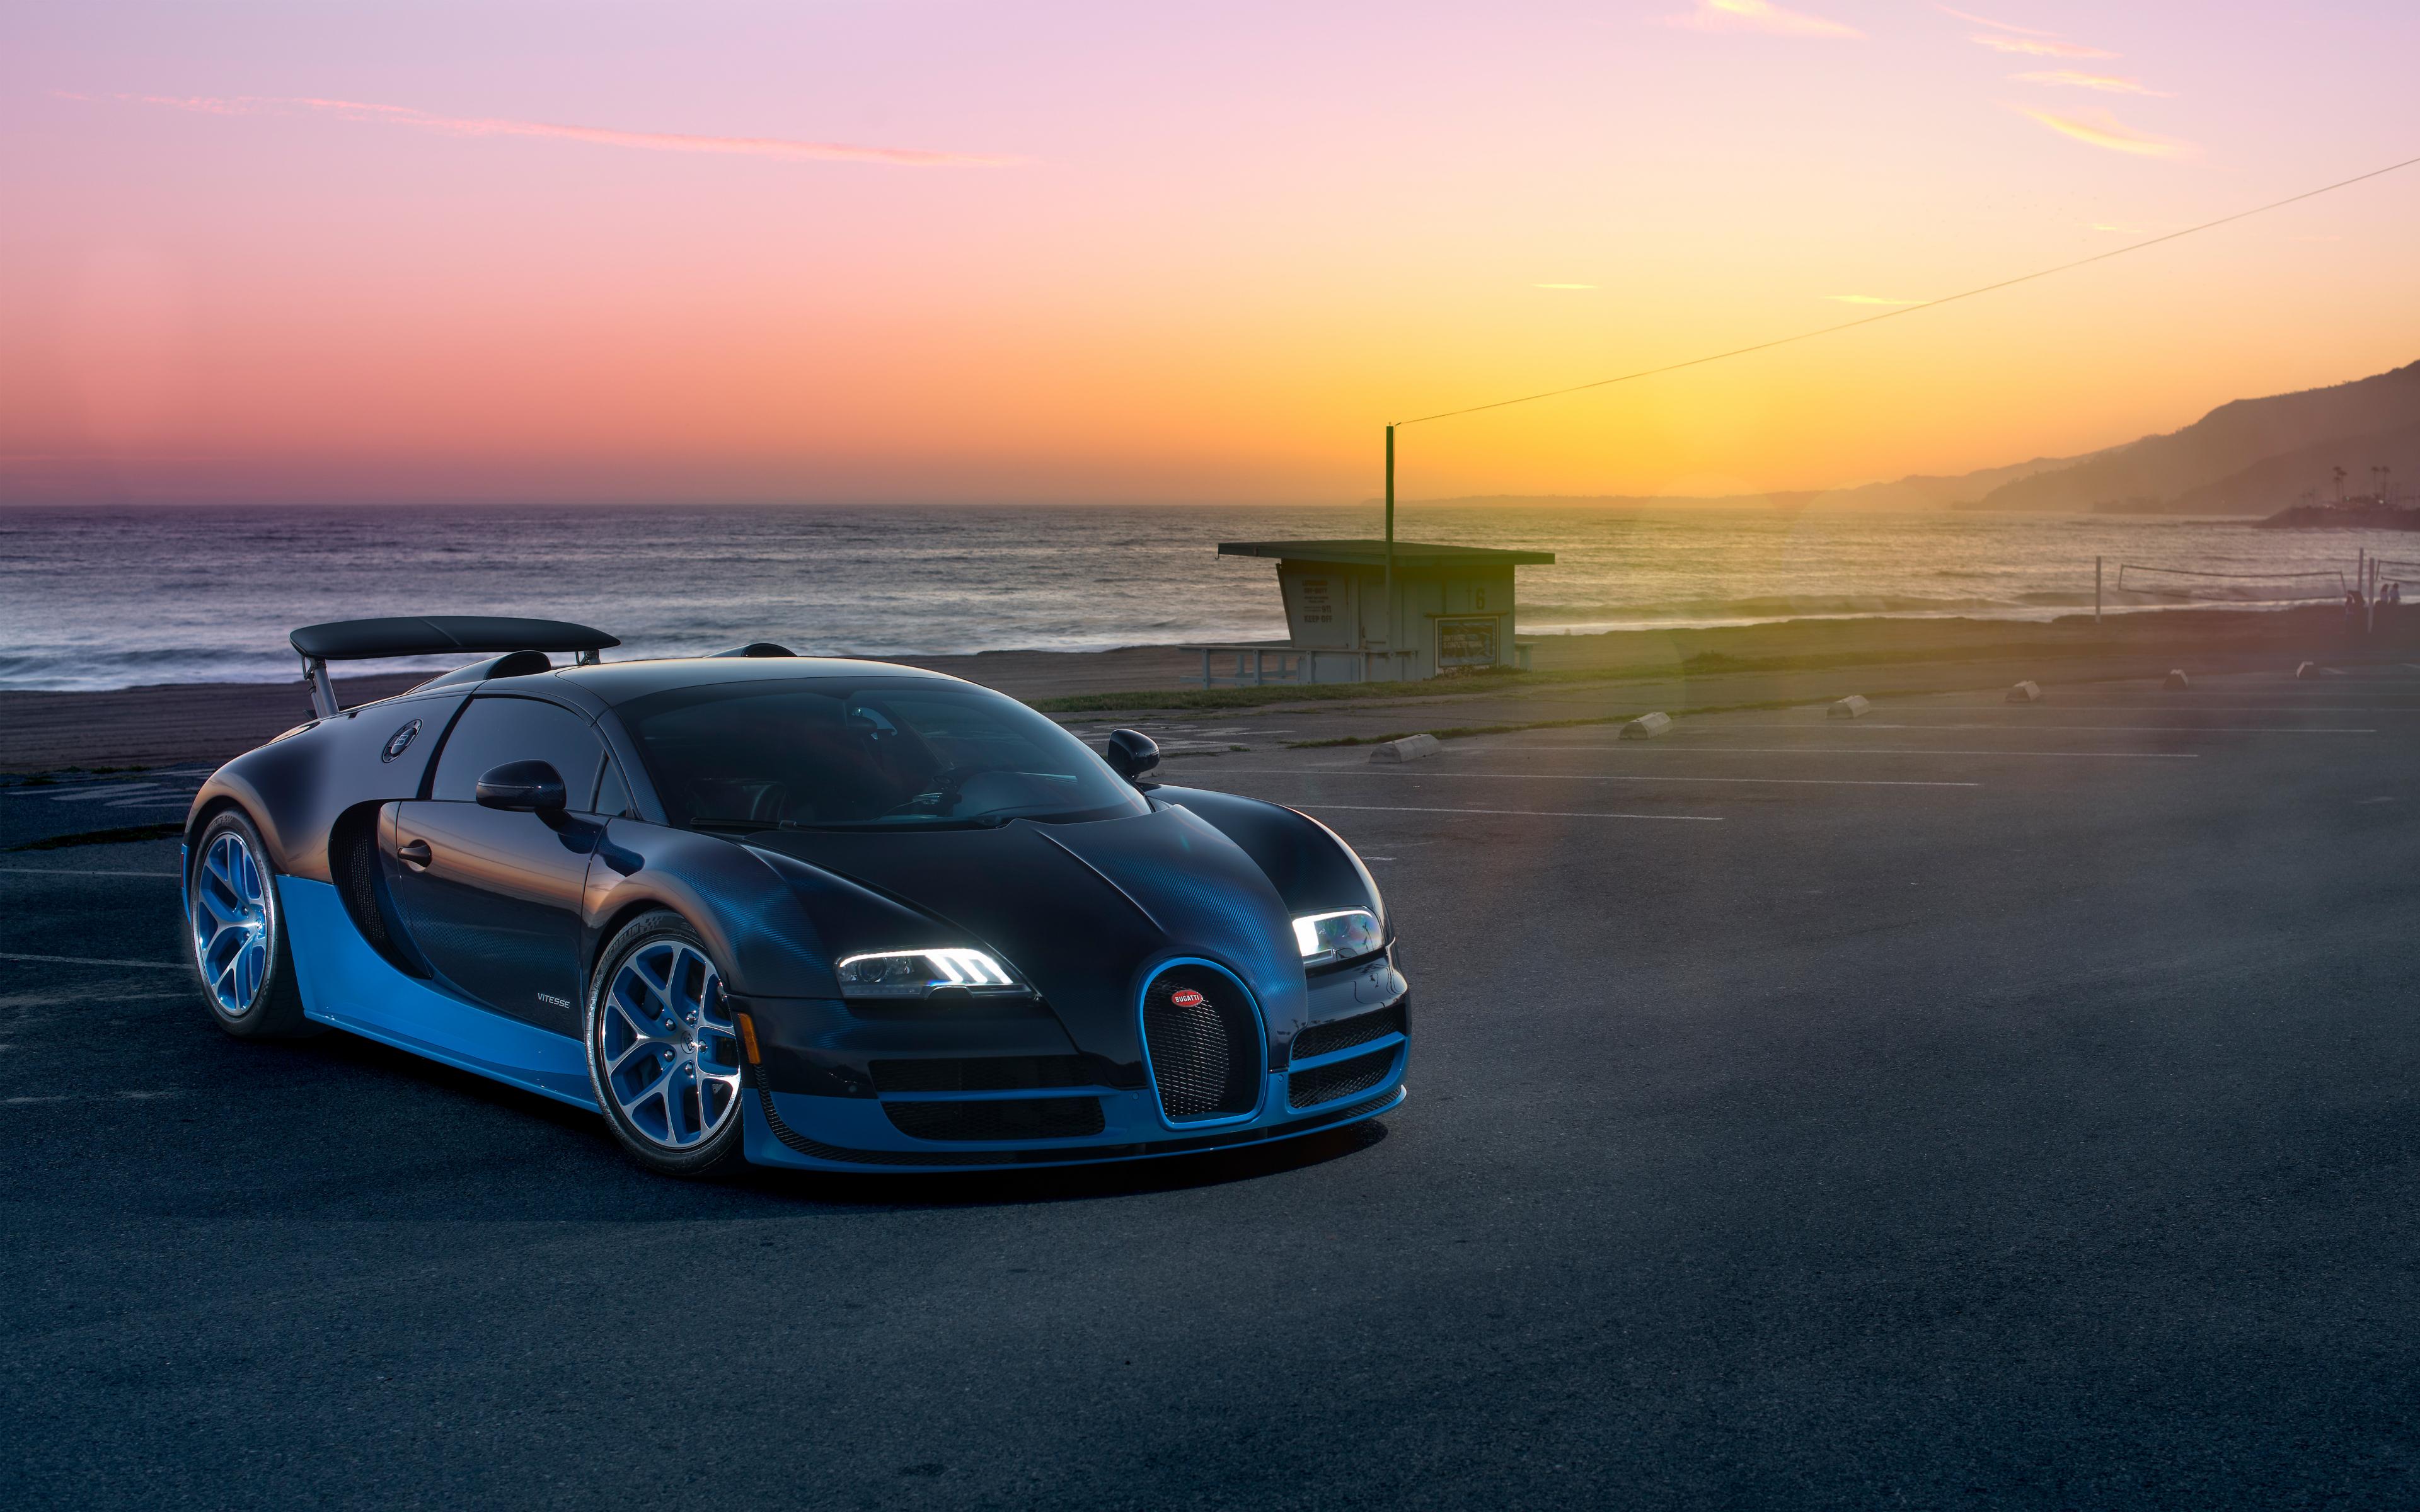 Download 3840x2400 Wallpaper Bugatti Veyron Grand Sport Vitesse Car